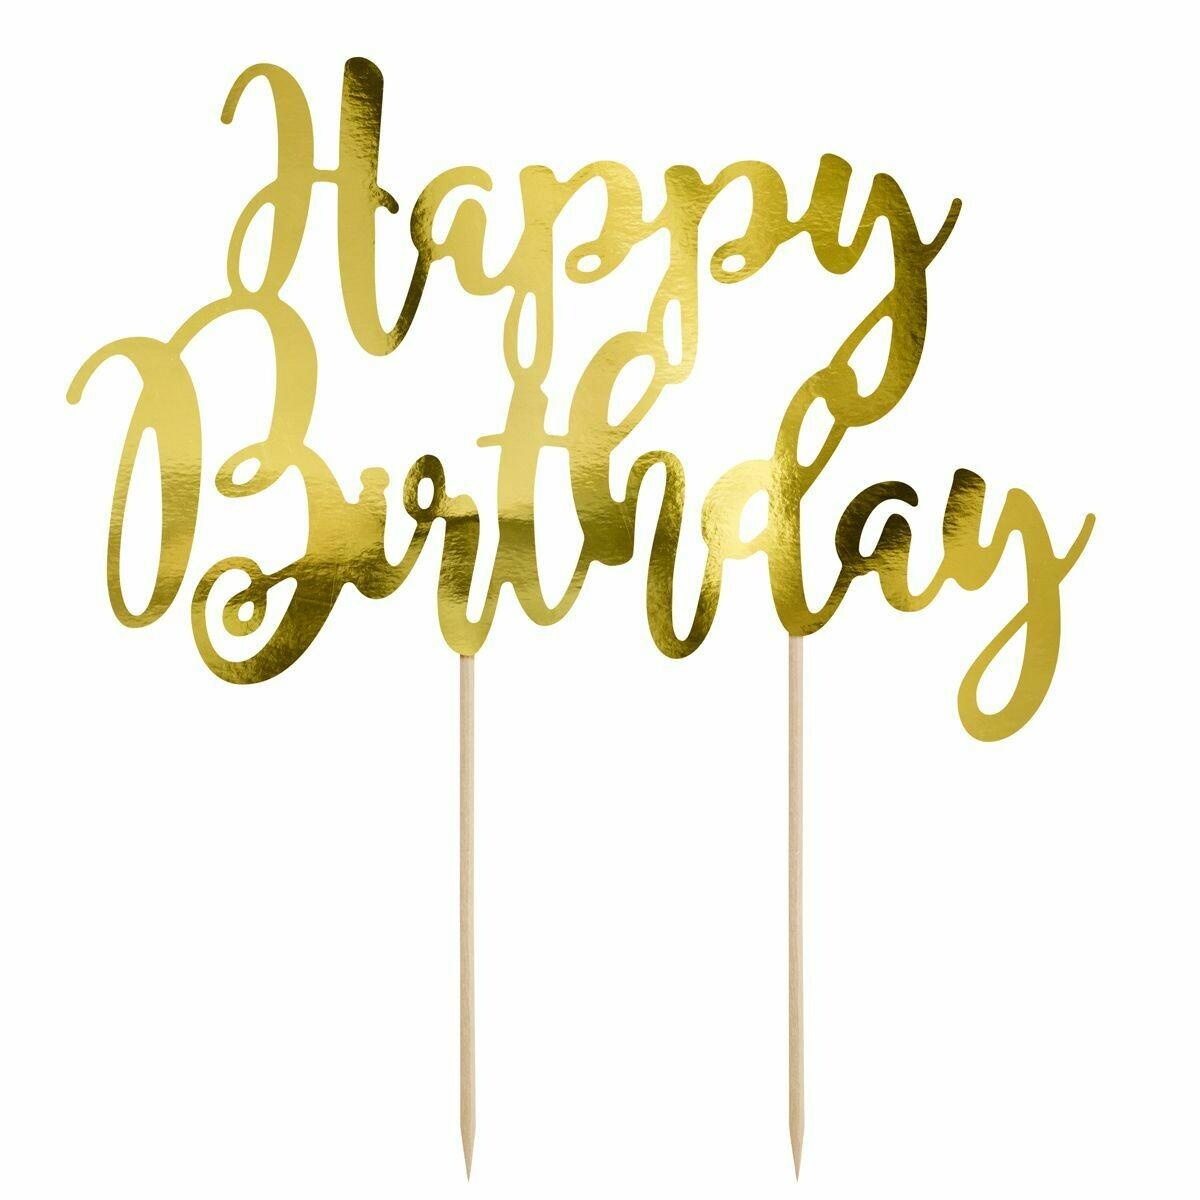 PartyDeco Cake Topper 'Happy Birthday' - GOLD -Τόπερ Τούρτας Χρυσό - 'Happy Birthday'